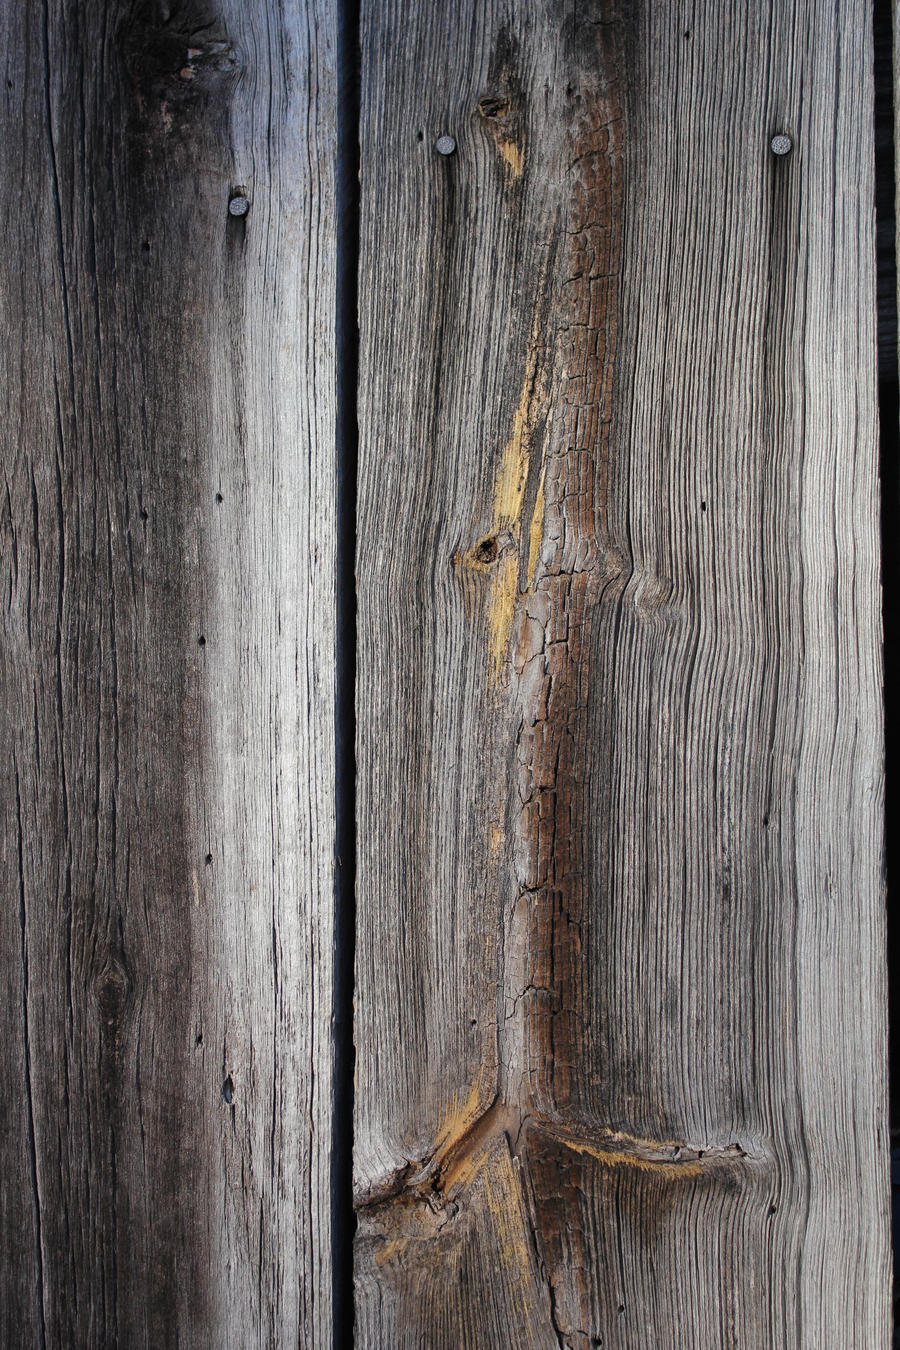 Barn Wood Texture barn wood texture 01thy-darkest-hour on deviantart